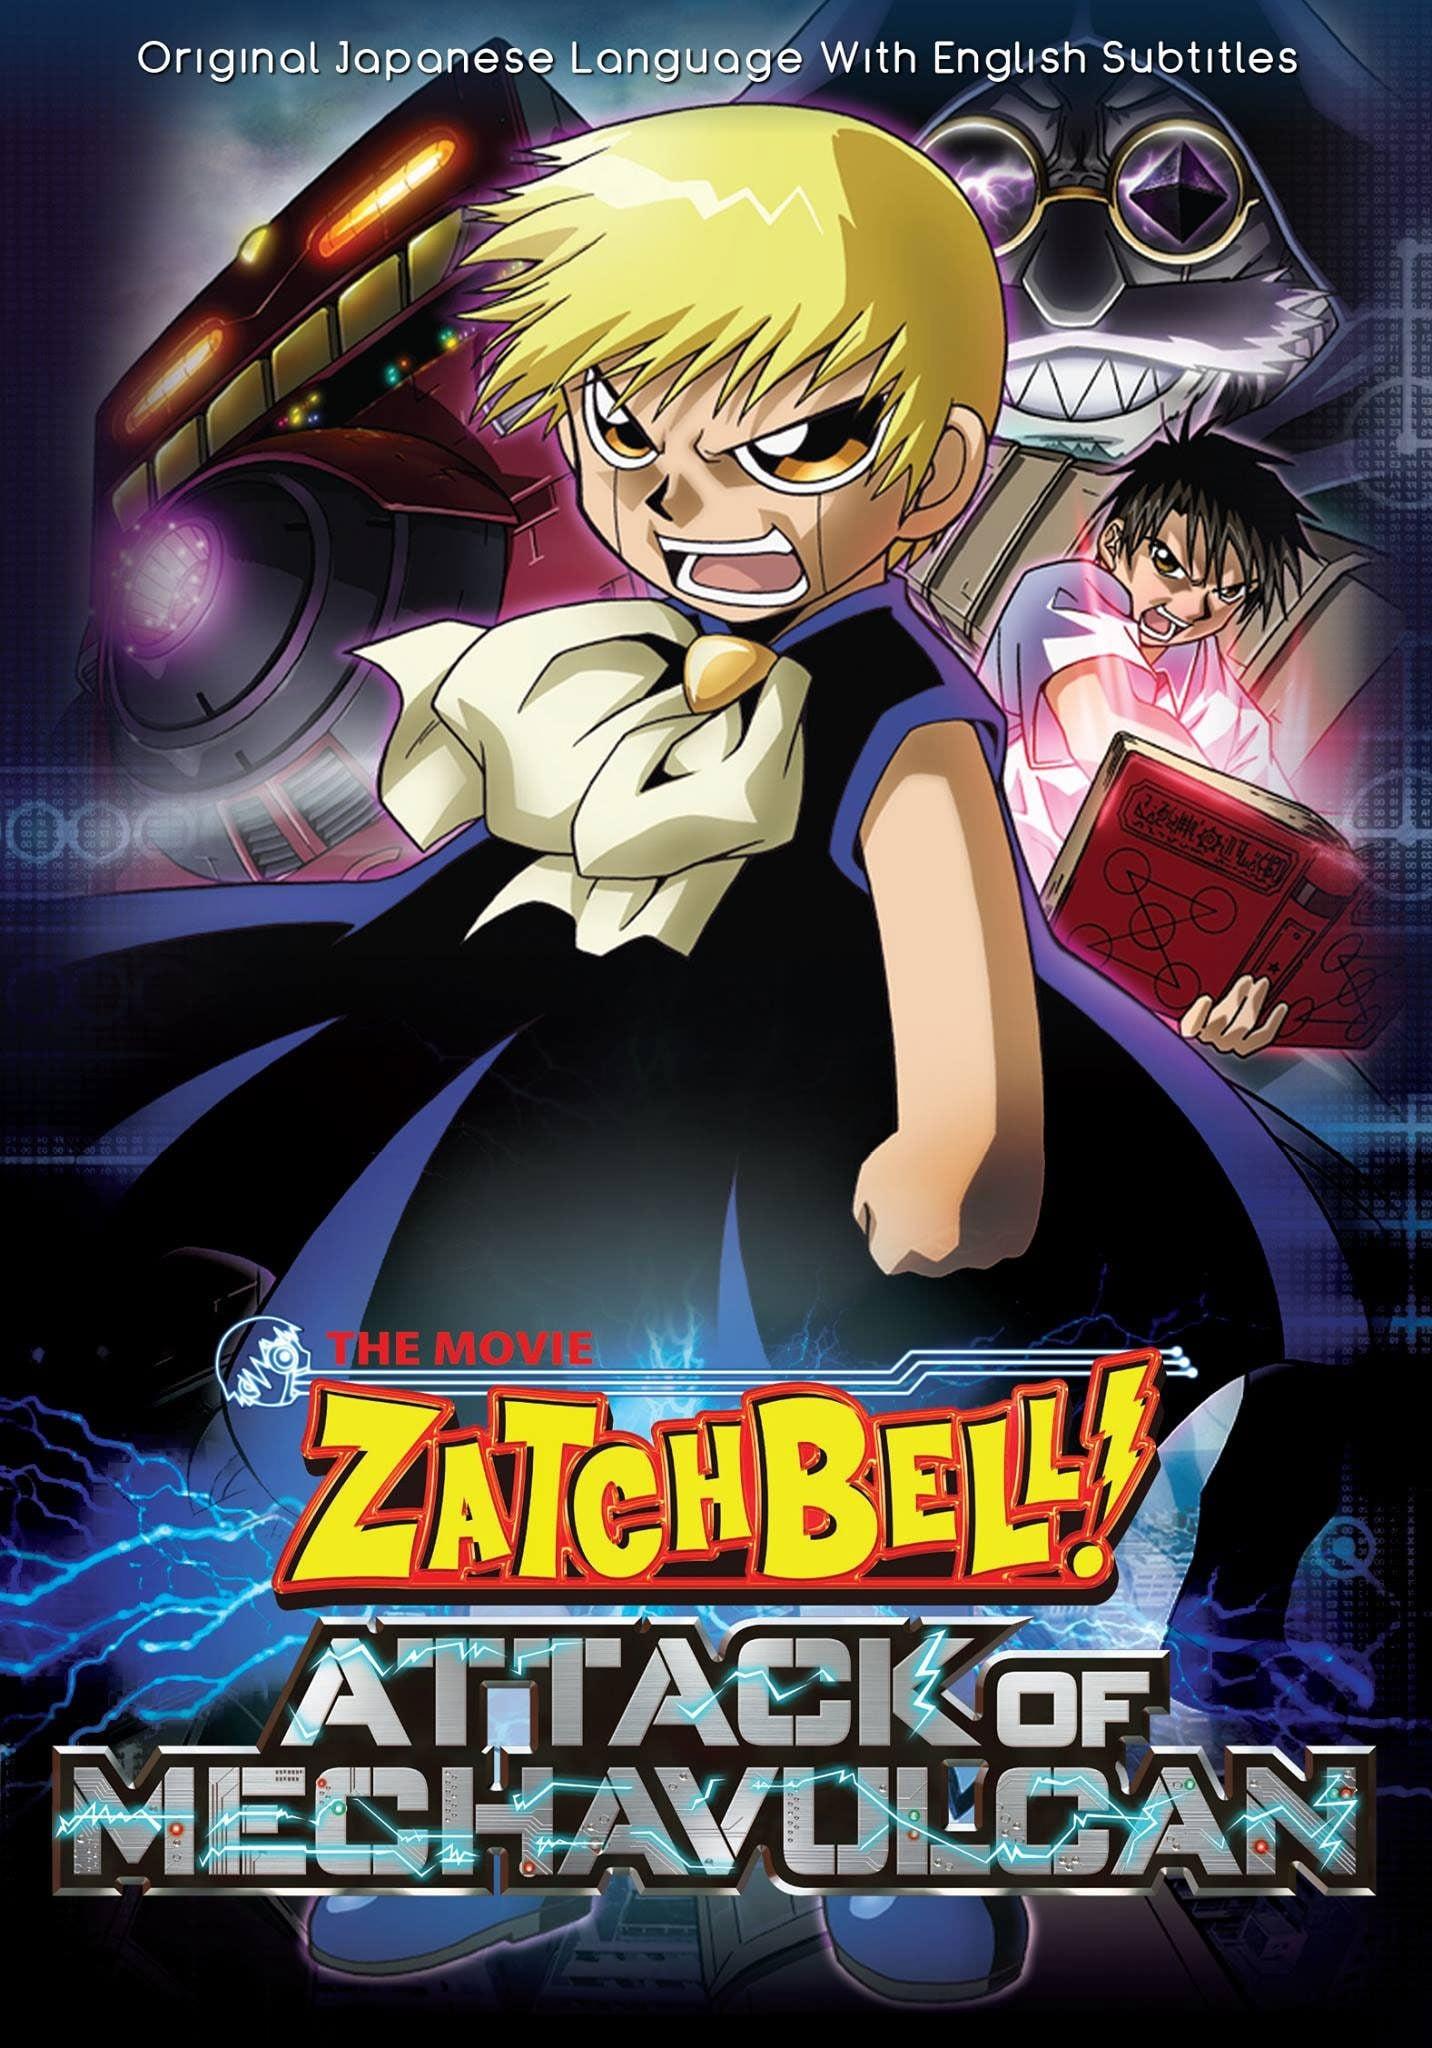 Zatch Bell! Attack of Mechavulcan